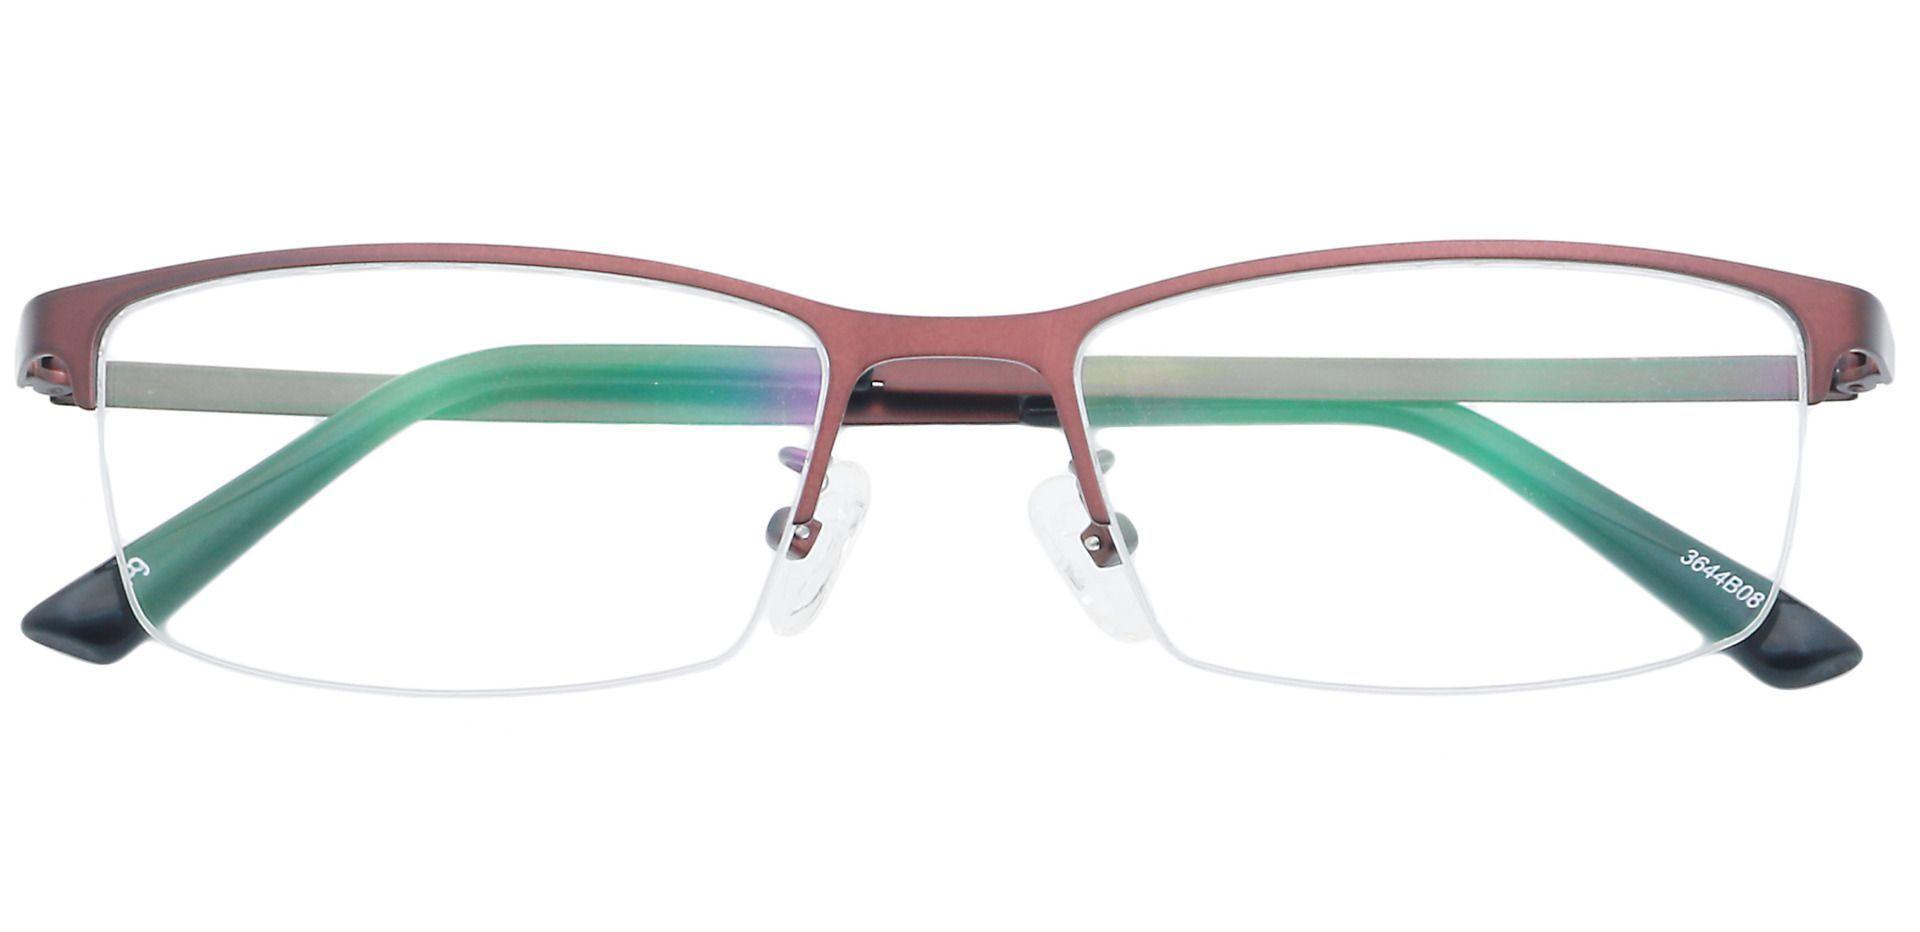 Parsley Rectangle Eyeglasses Frame - Brown